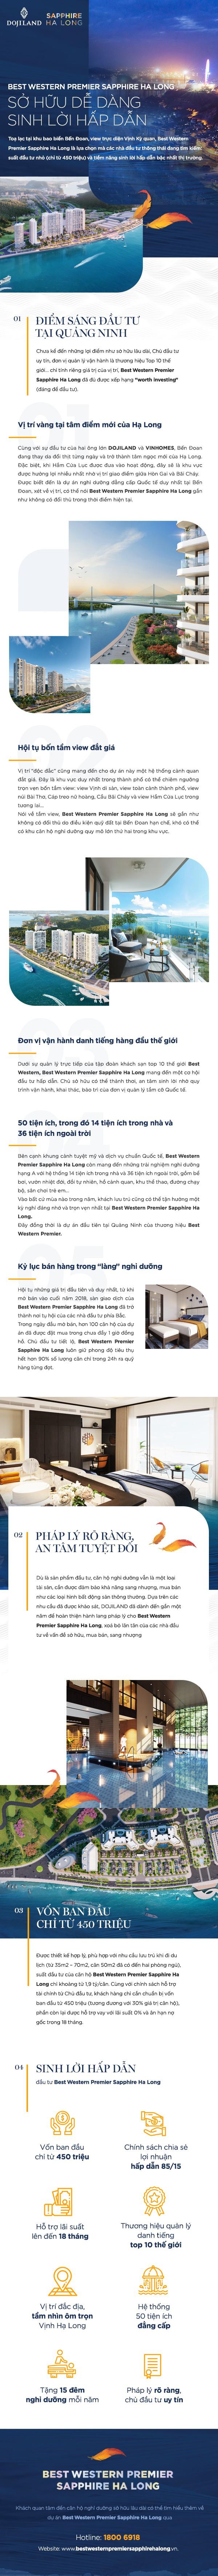 Best Western Premier Sapphire Ha Long: Sở hữu dễ dàng - sinh lời hấp dẫn - Ảnh 1.